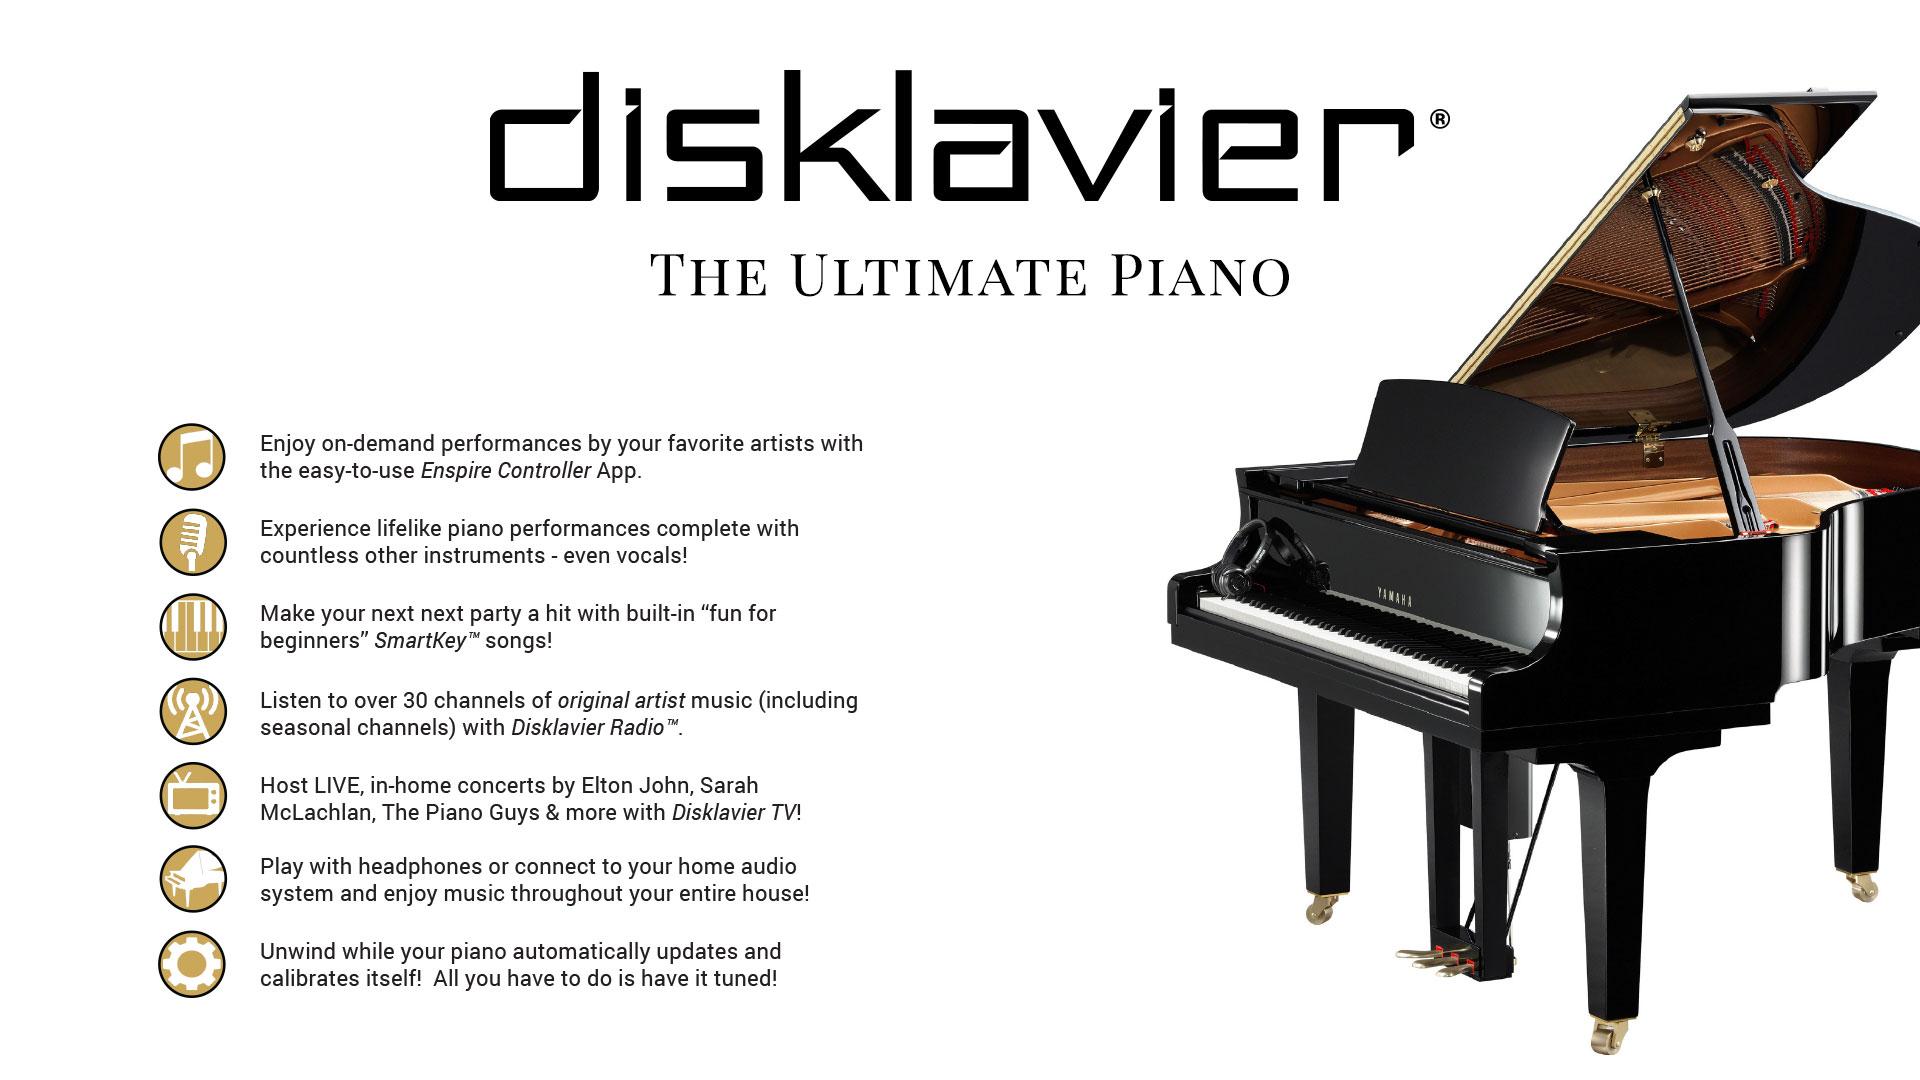 Yamaha DCFX | Disklavier ENSPIRE Pro Premium Concert Grand Piano